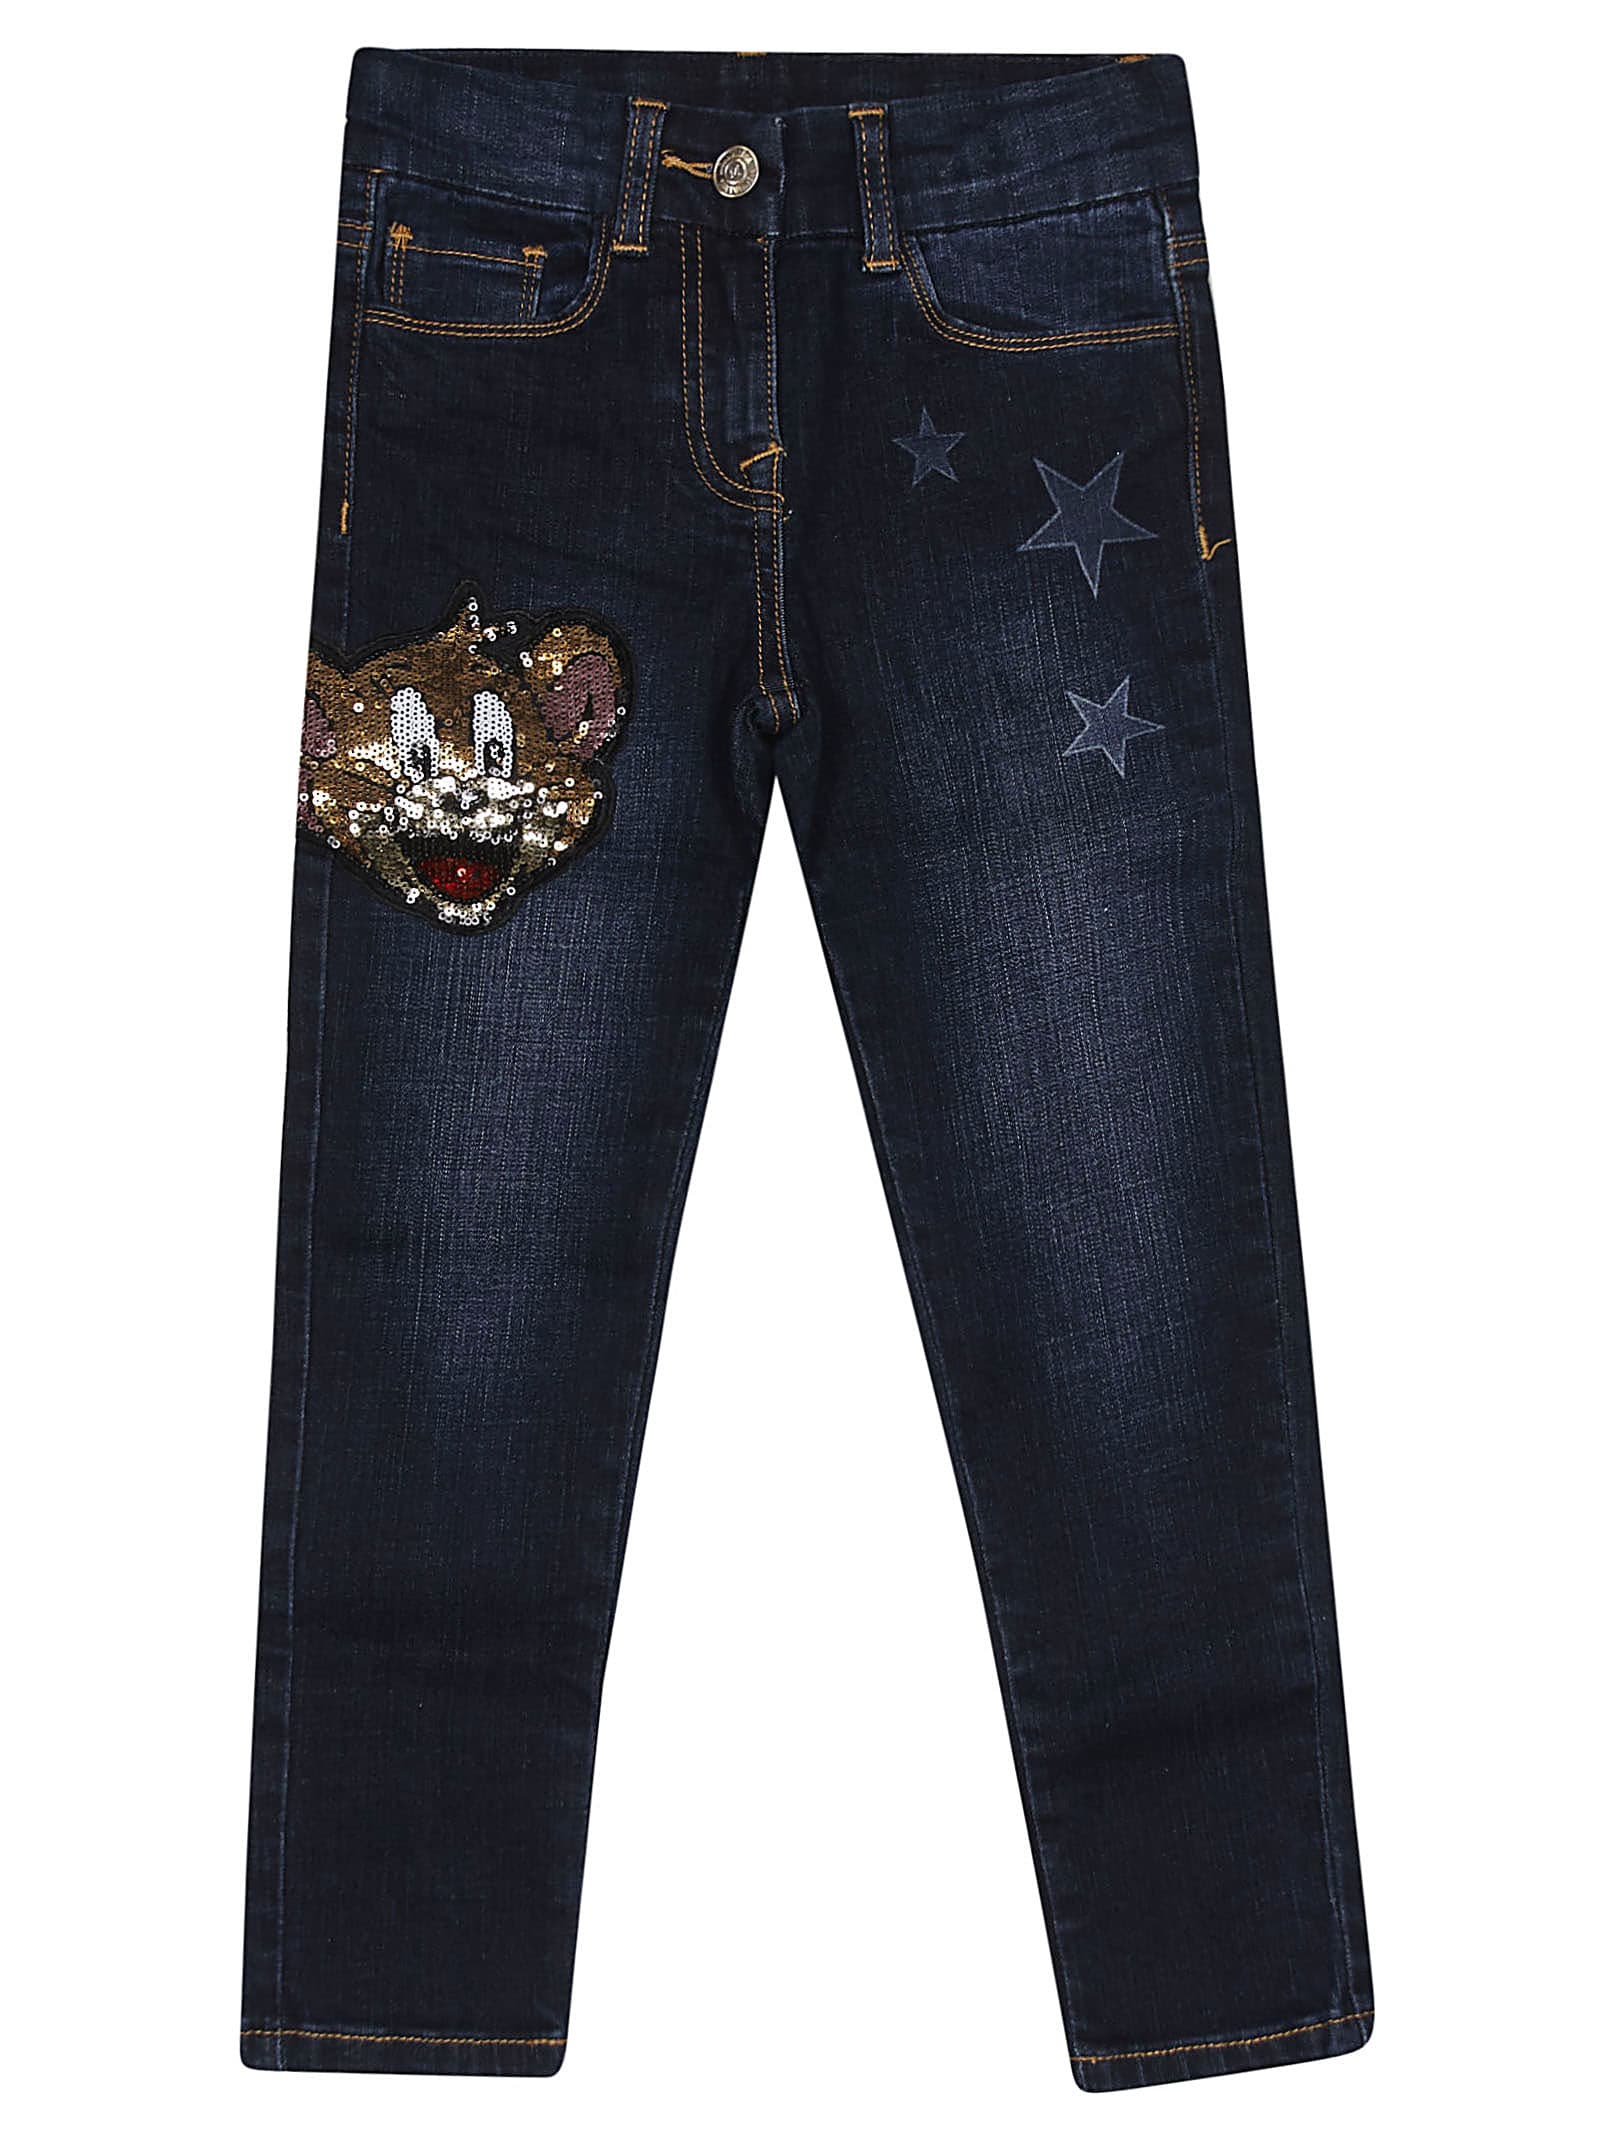 Embellished Jerry Jeans